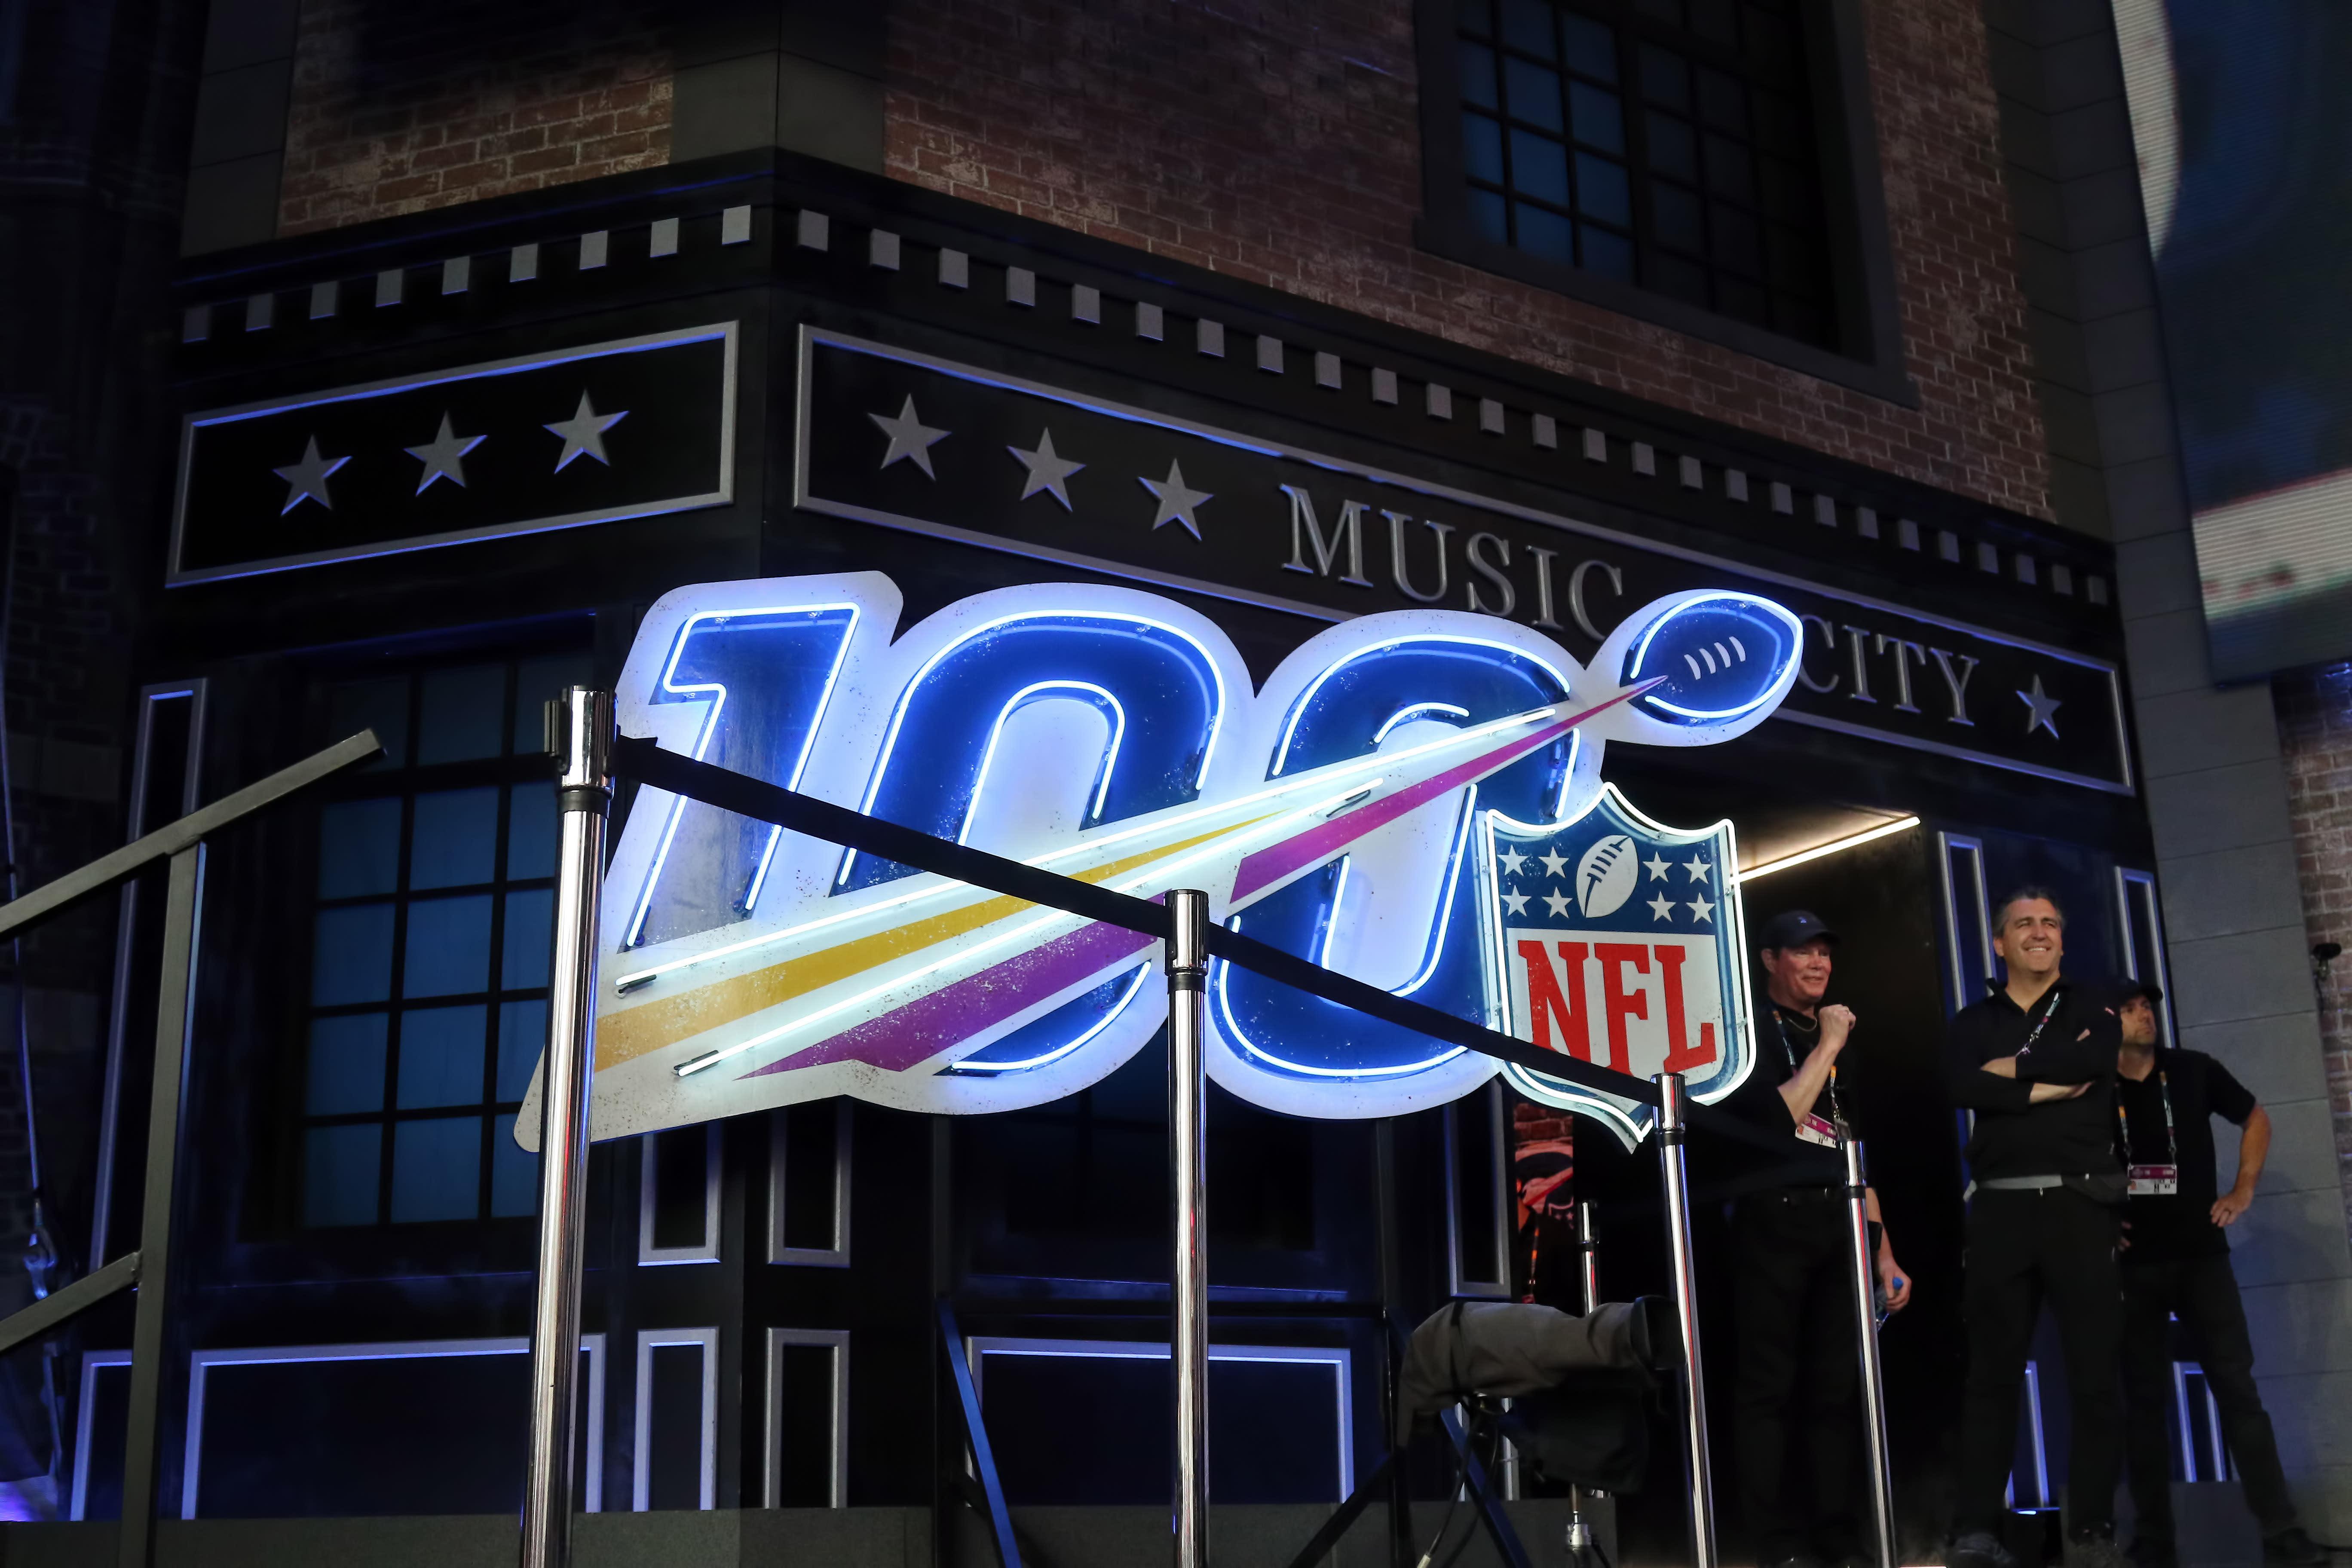 DAZN 'definitely interested' in bidding for NFL rights